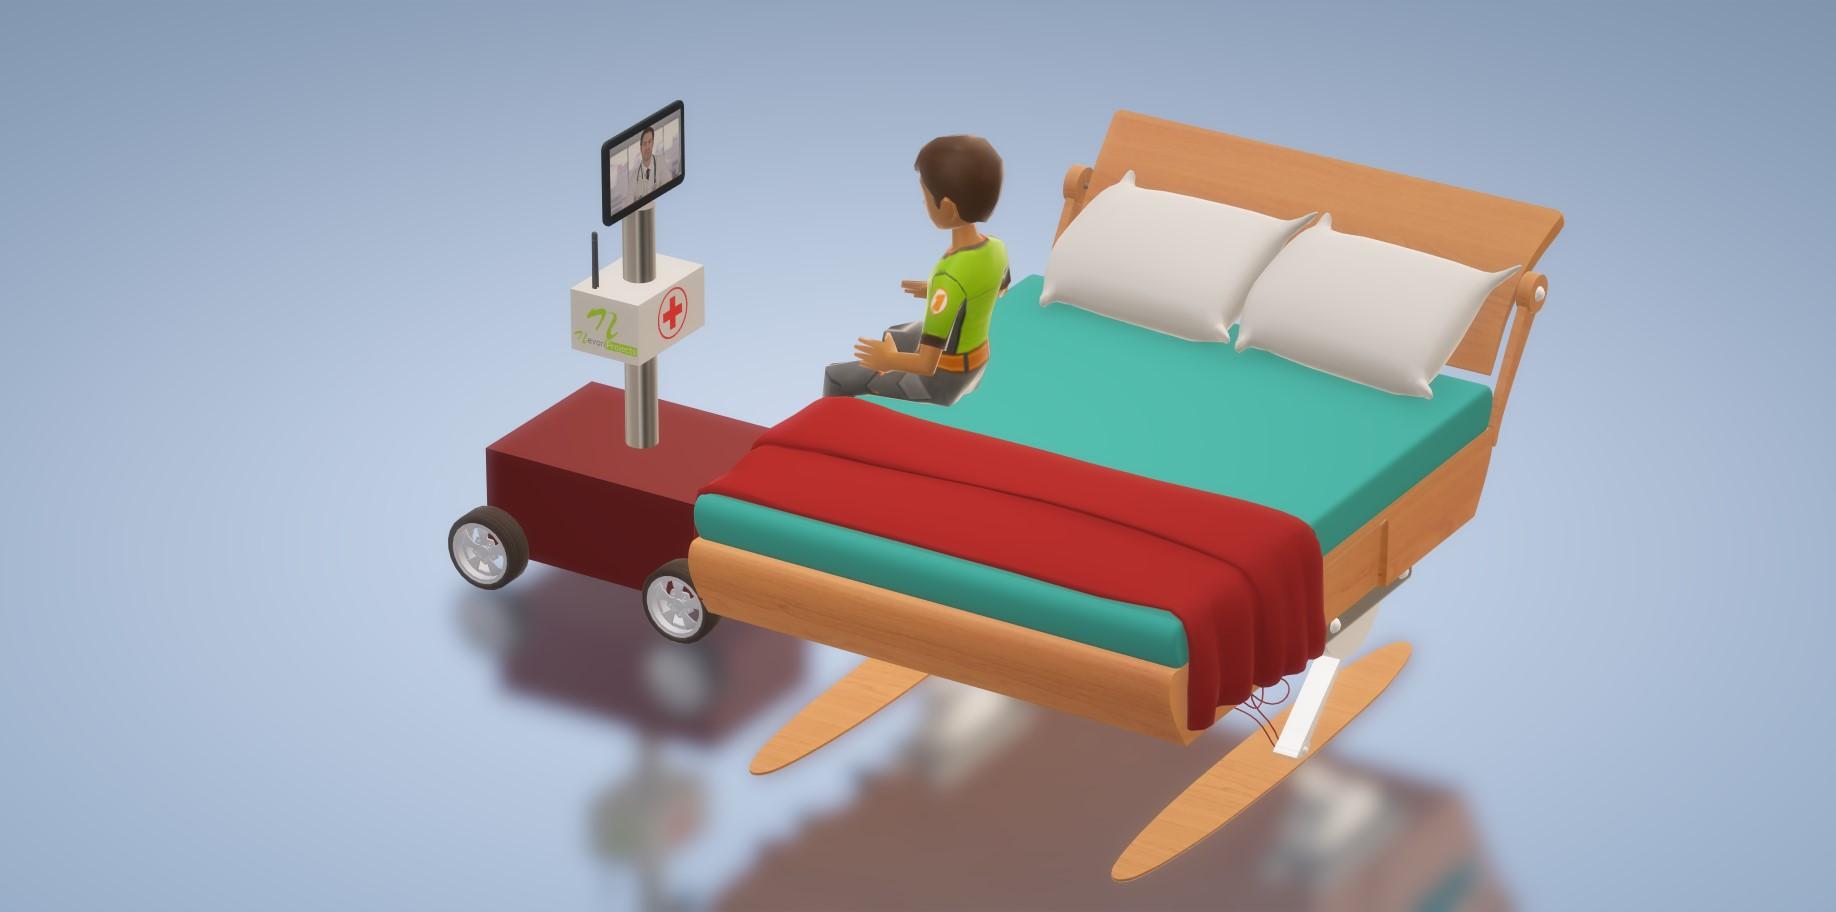 nevon virtual doctor robot